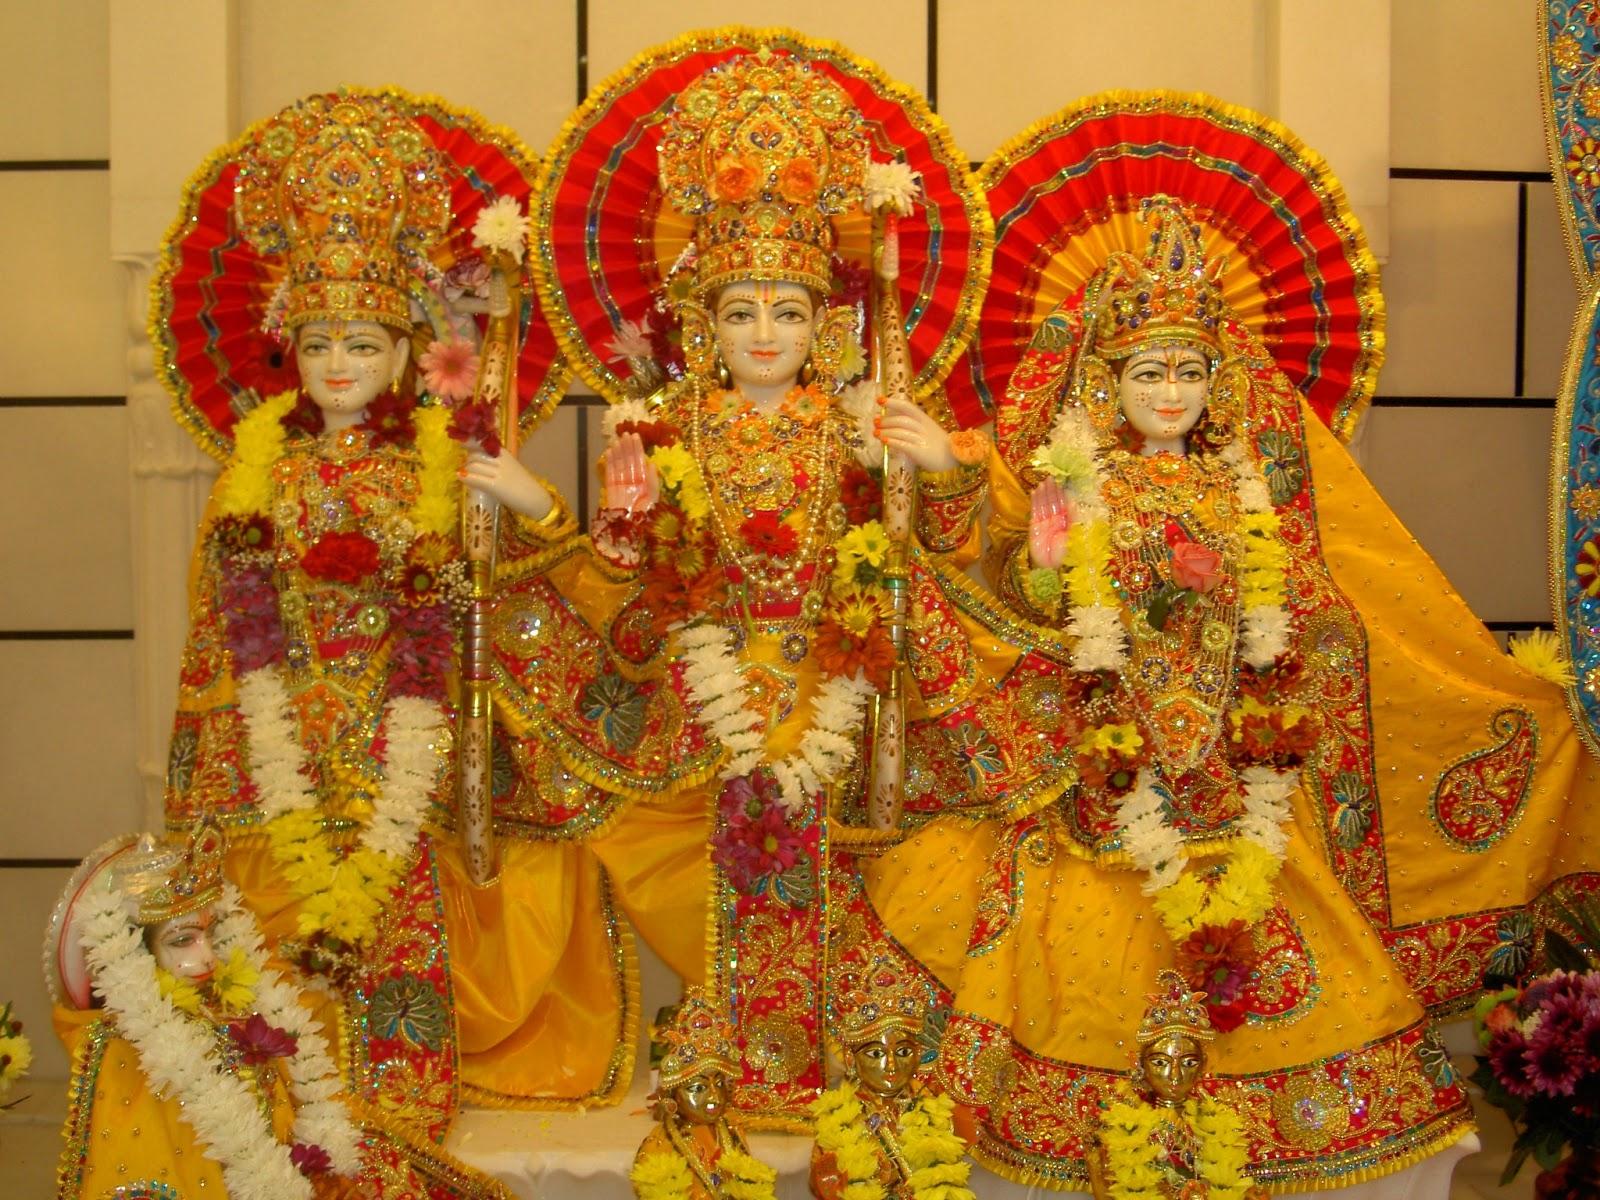 Download Wallpaper HD load shri ramgod ram sitaram lakhan 1600x1200